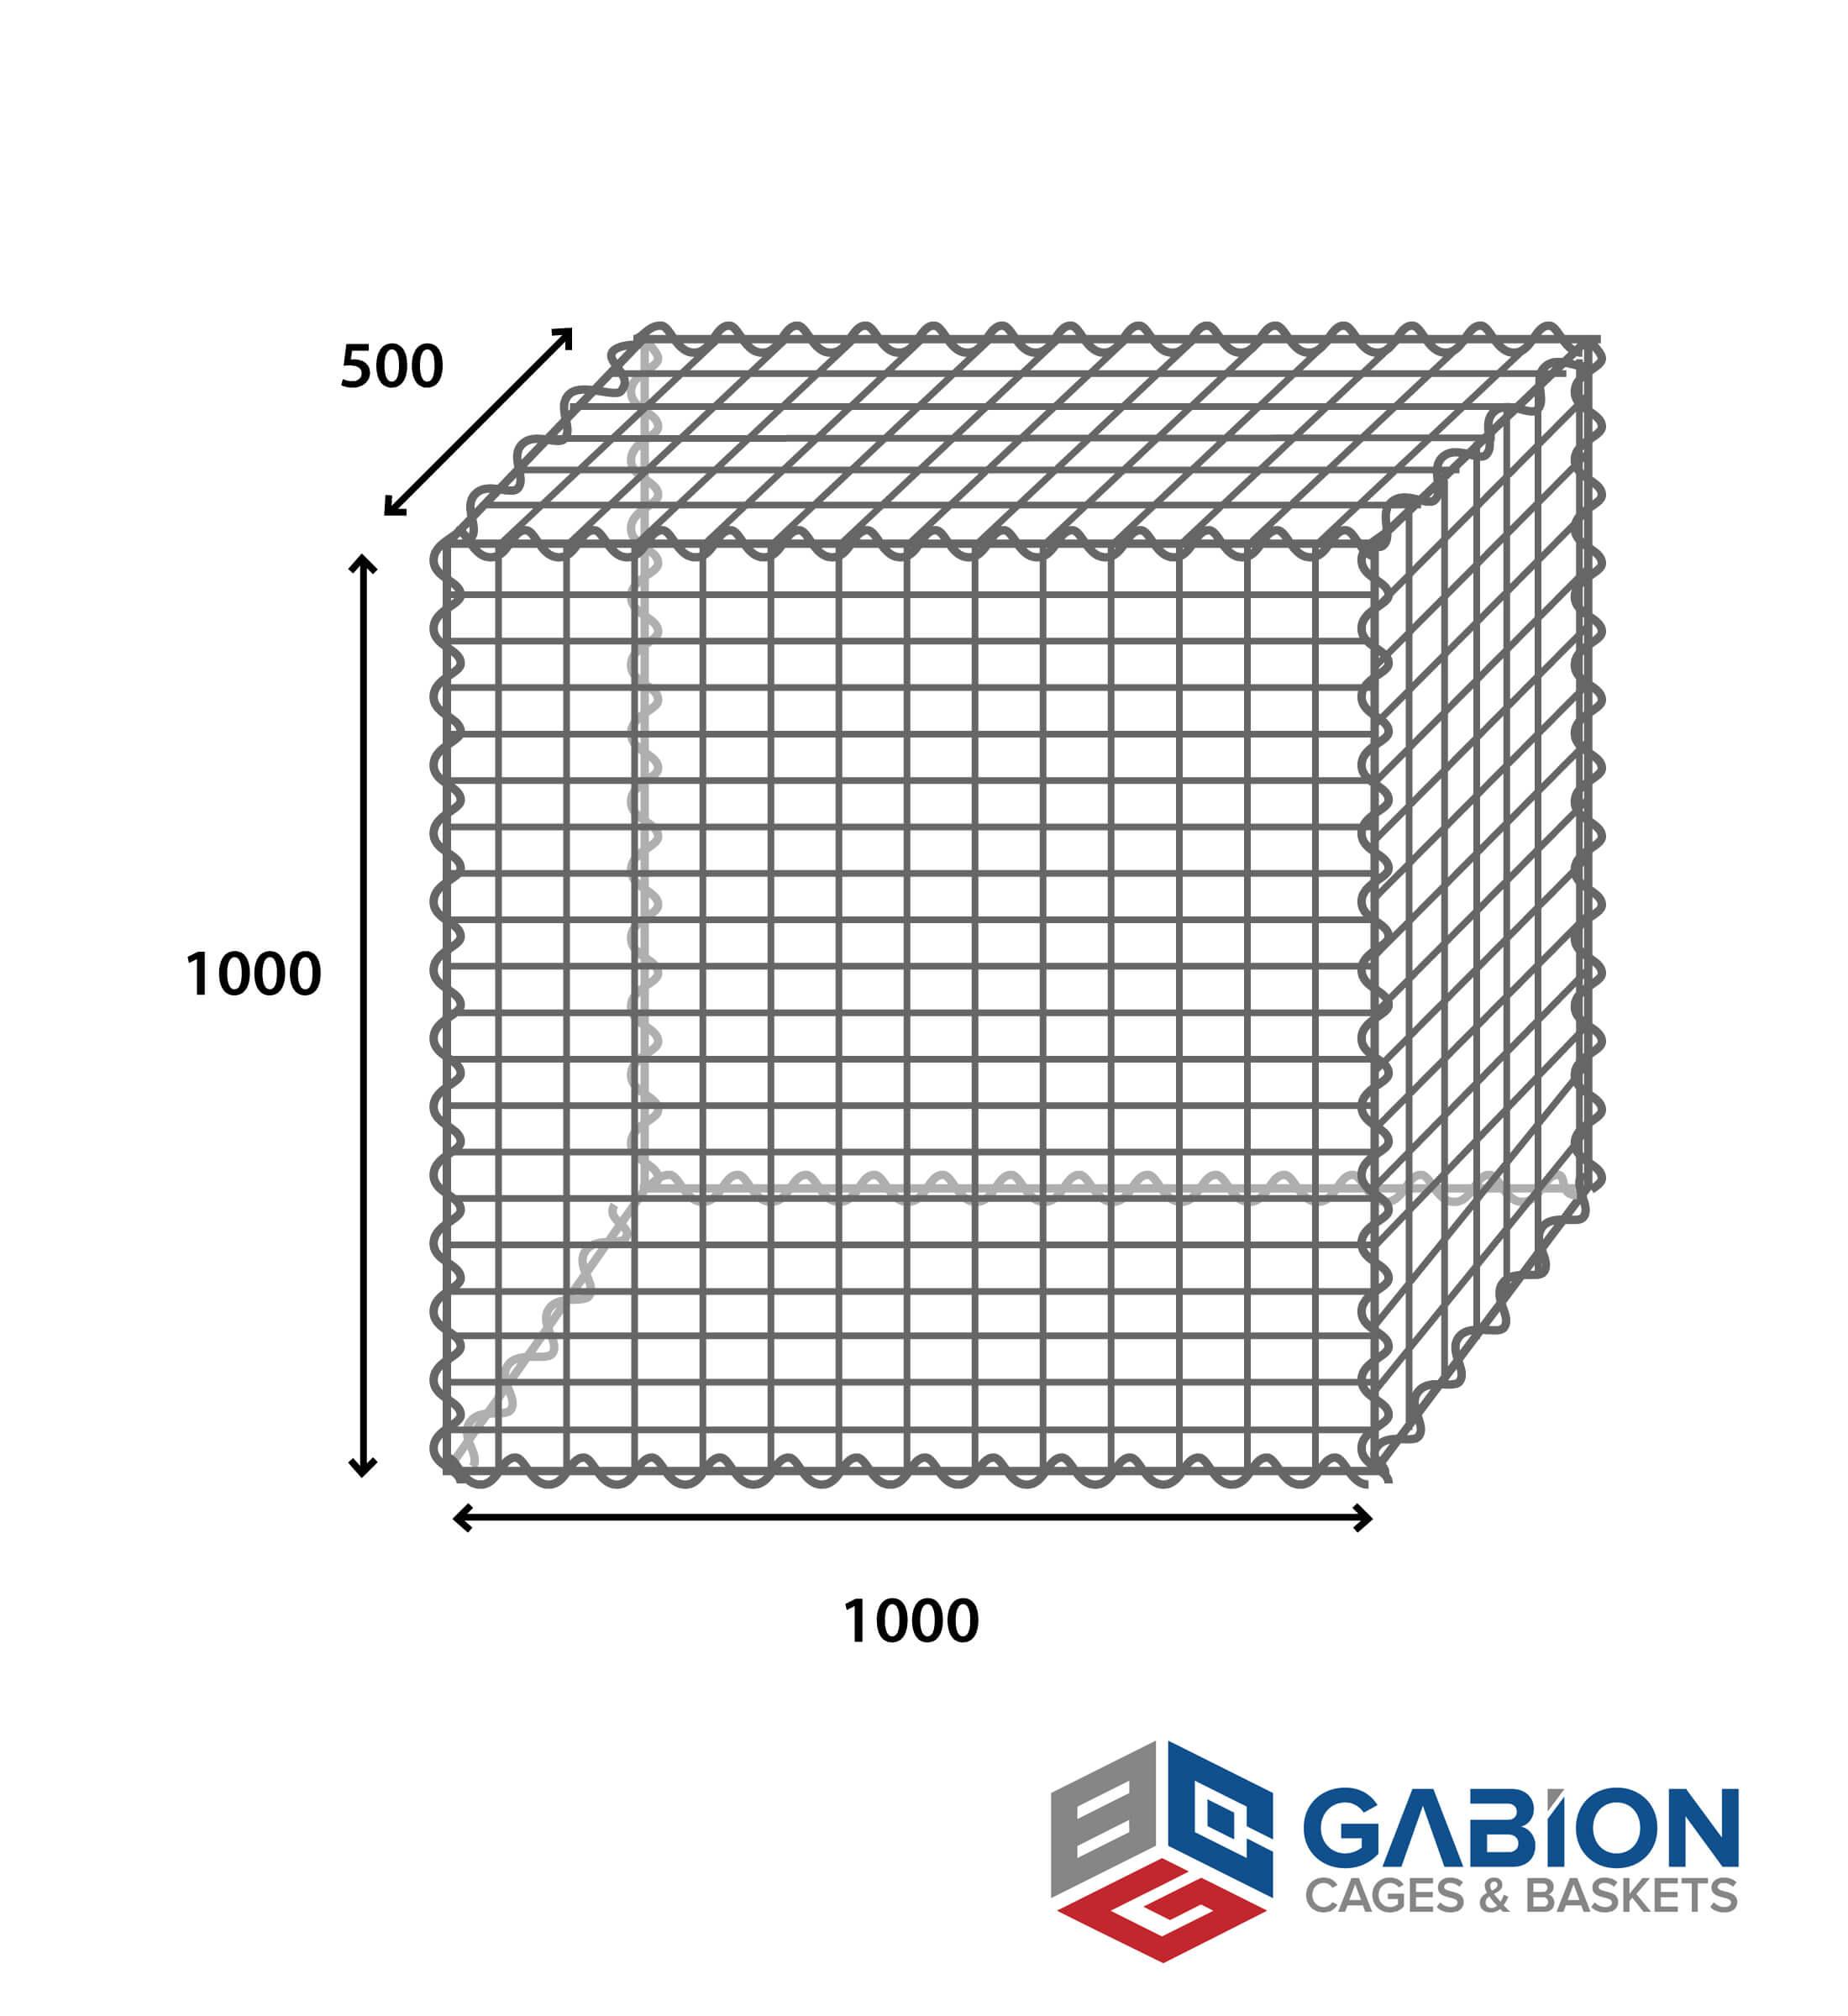 Century Gabion X X500 Erosion Control Rock Walls Amp Fences